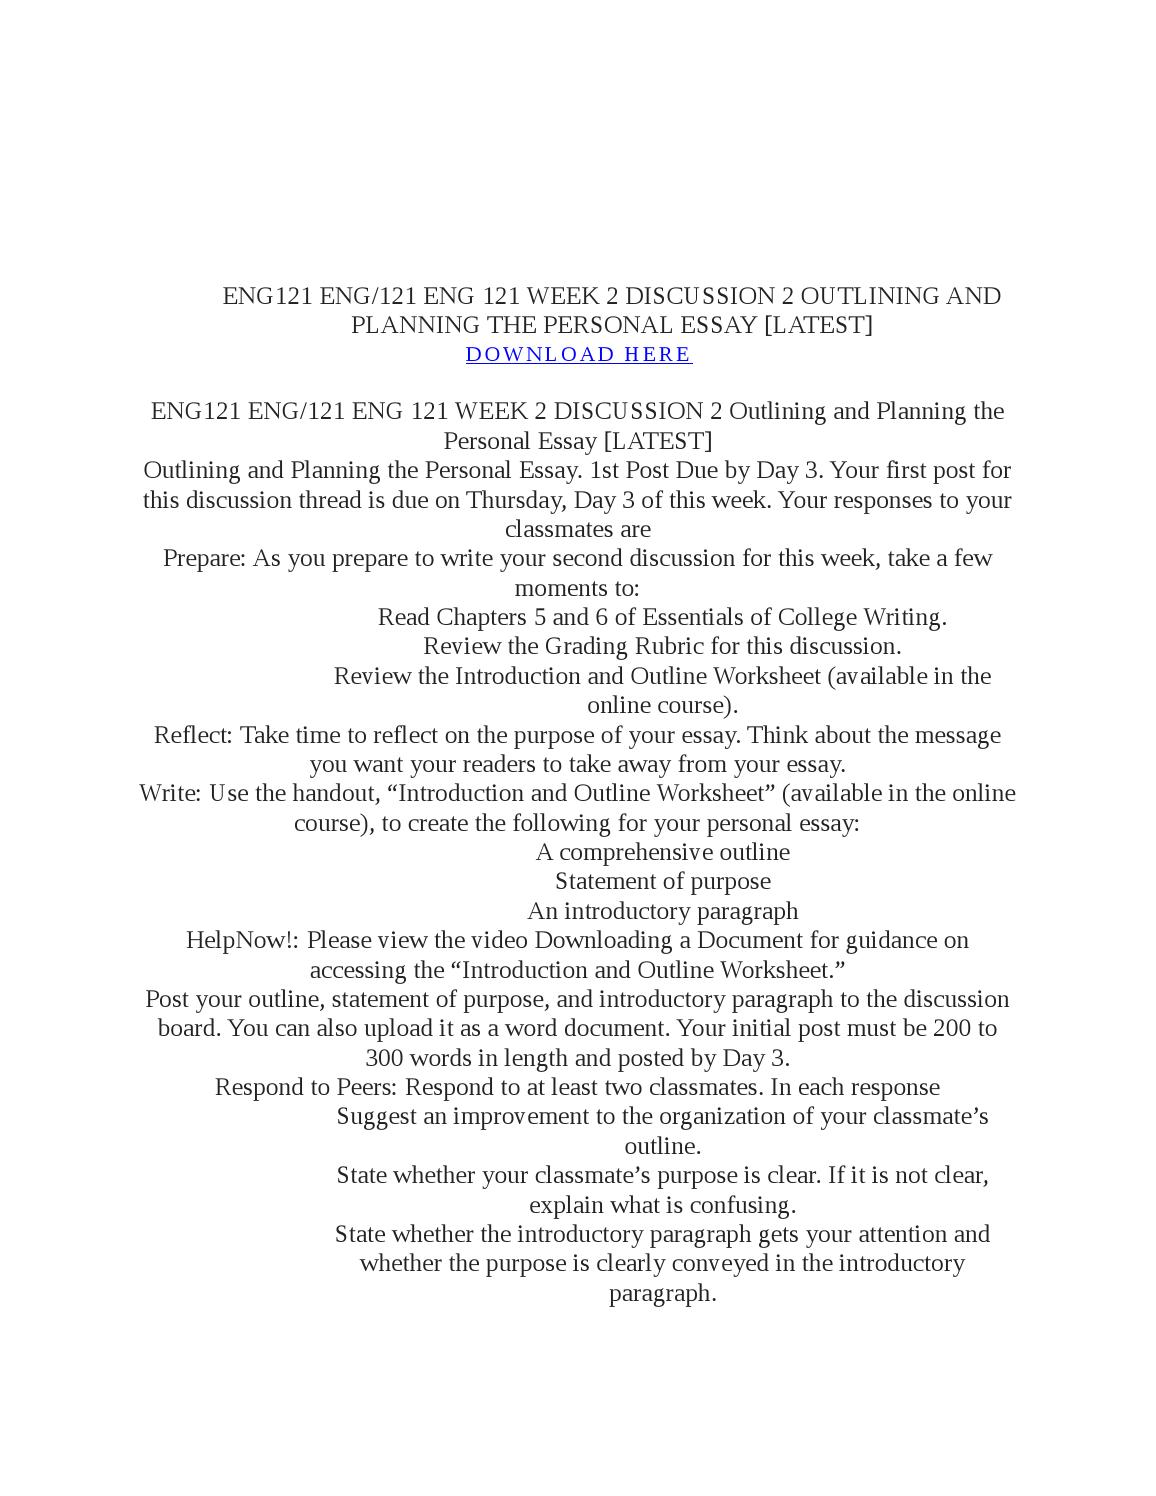 ENG 121 Week 1 Assignment Practice Essay